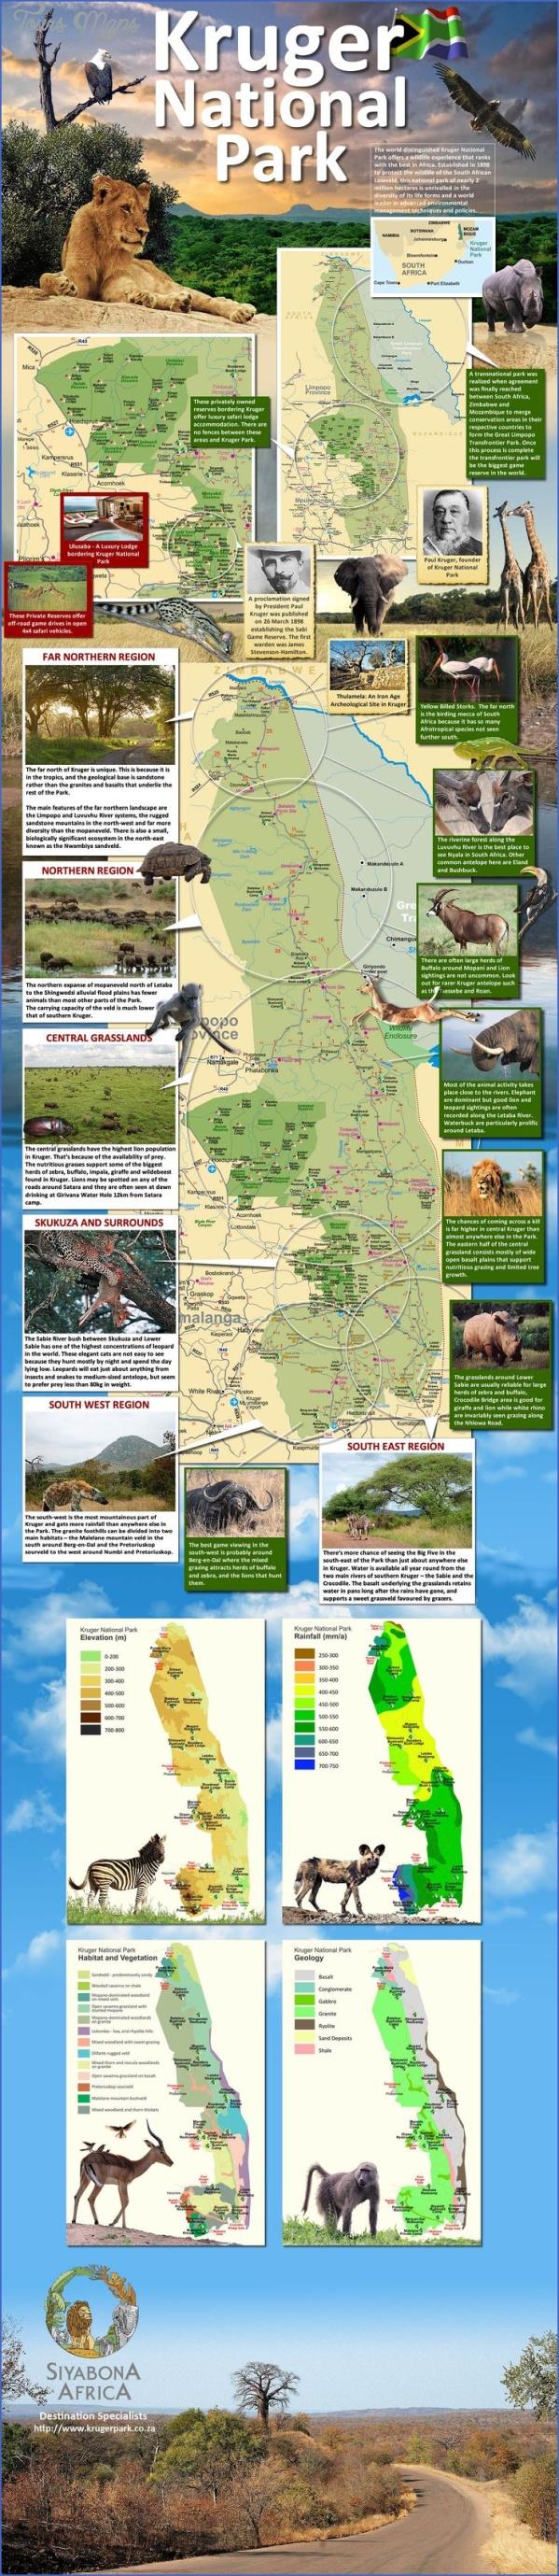 africa safari travels 12 Africa Safari Travels